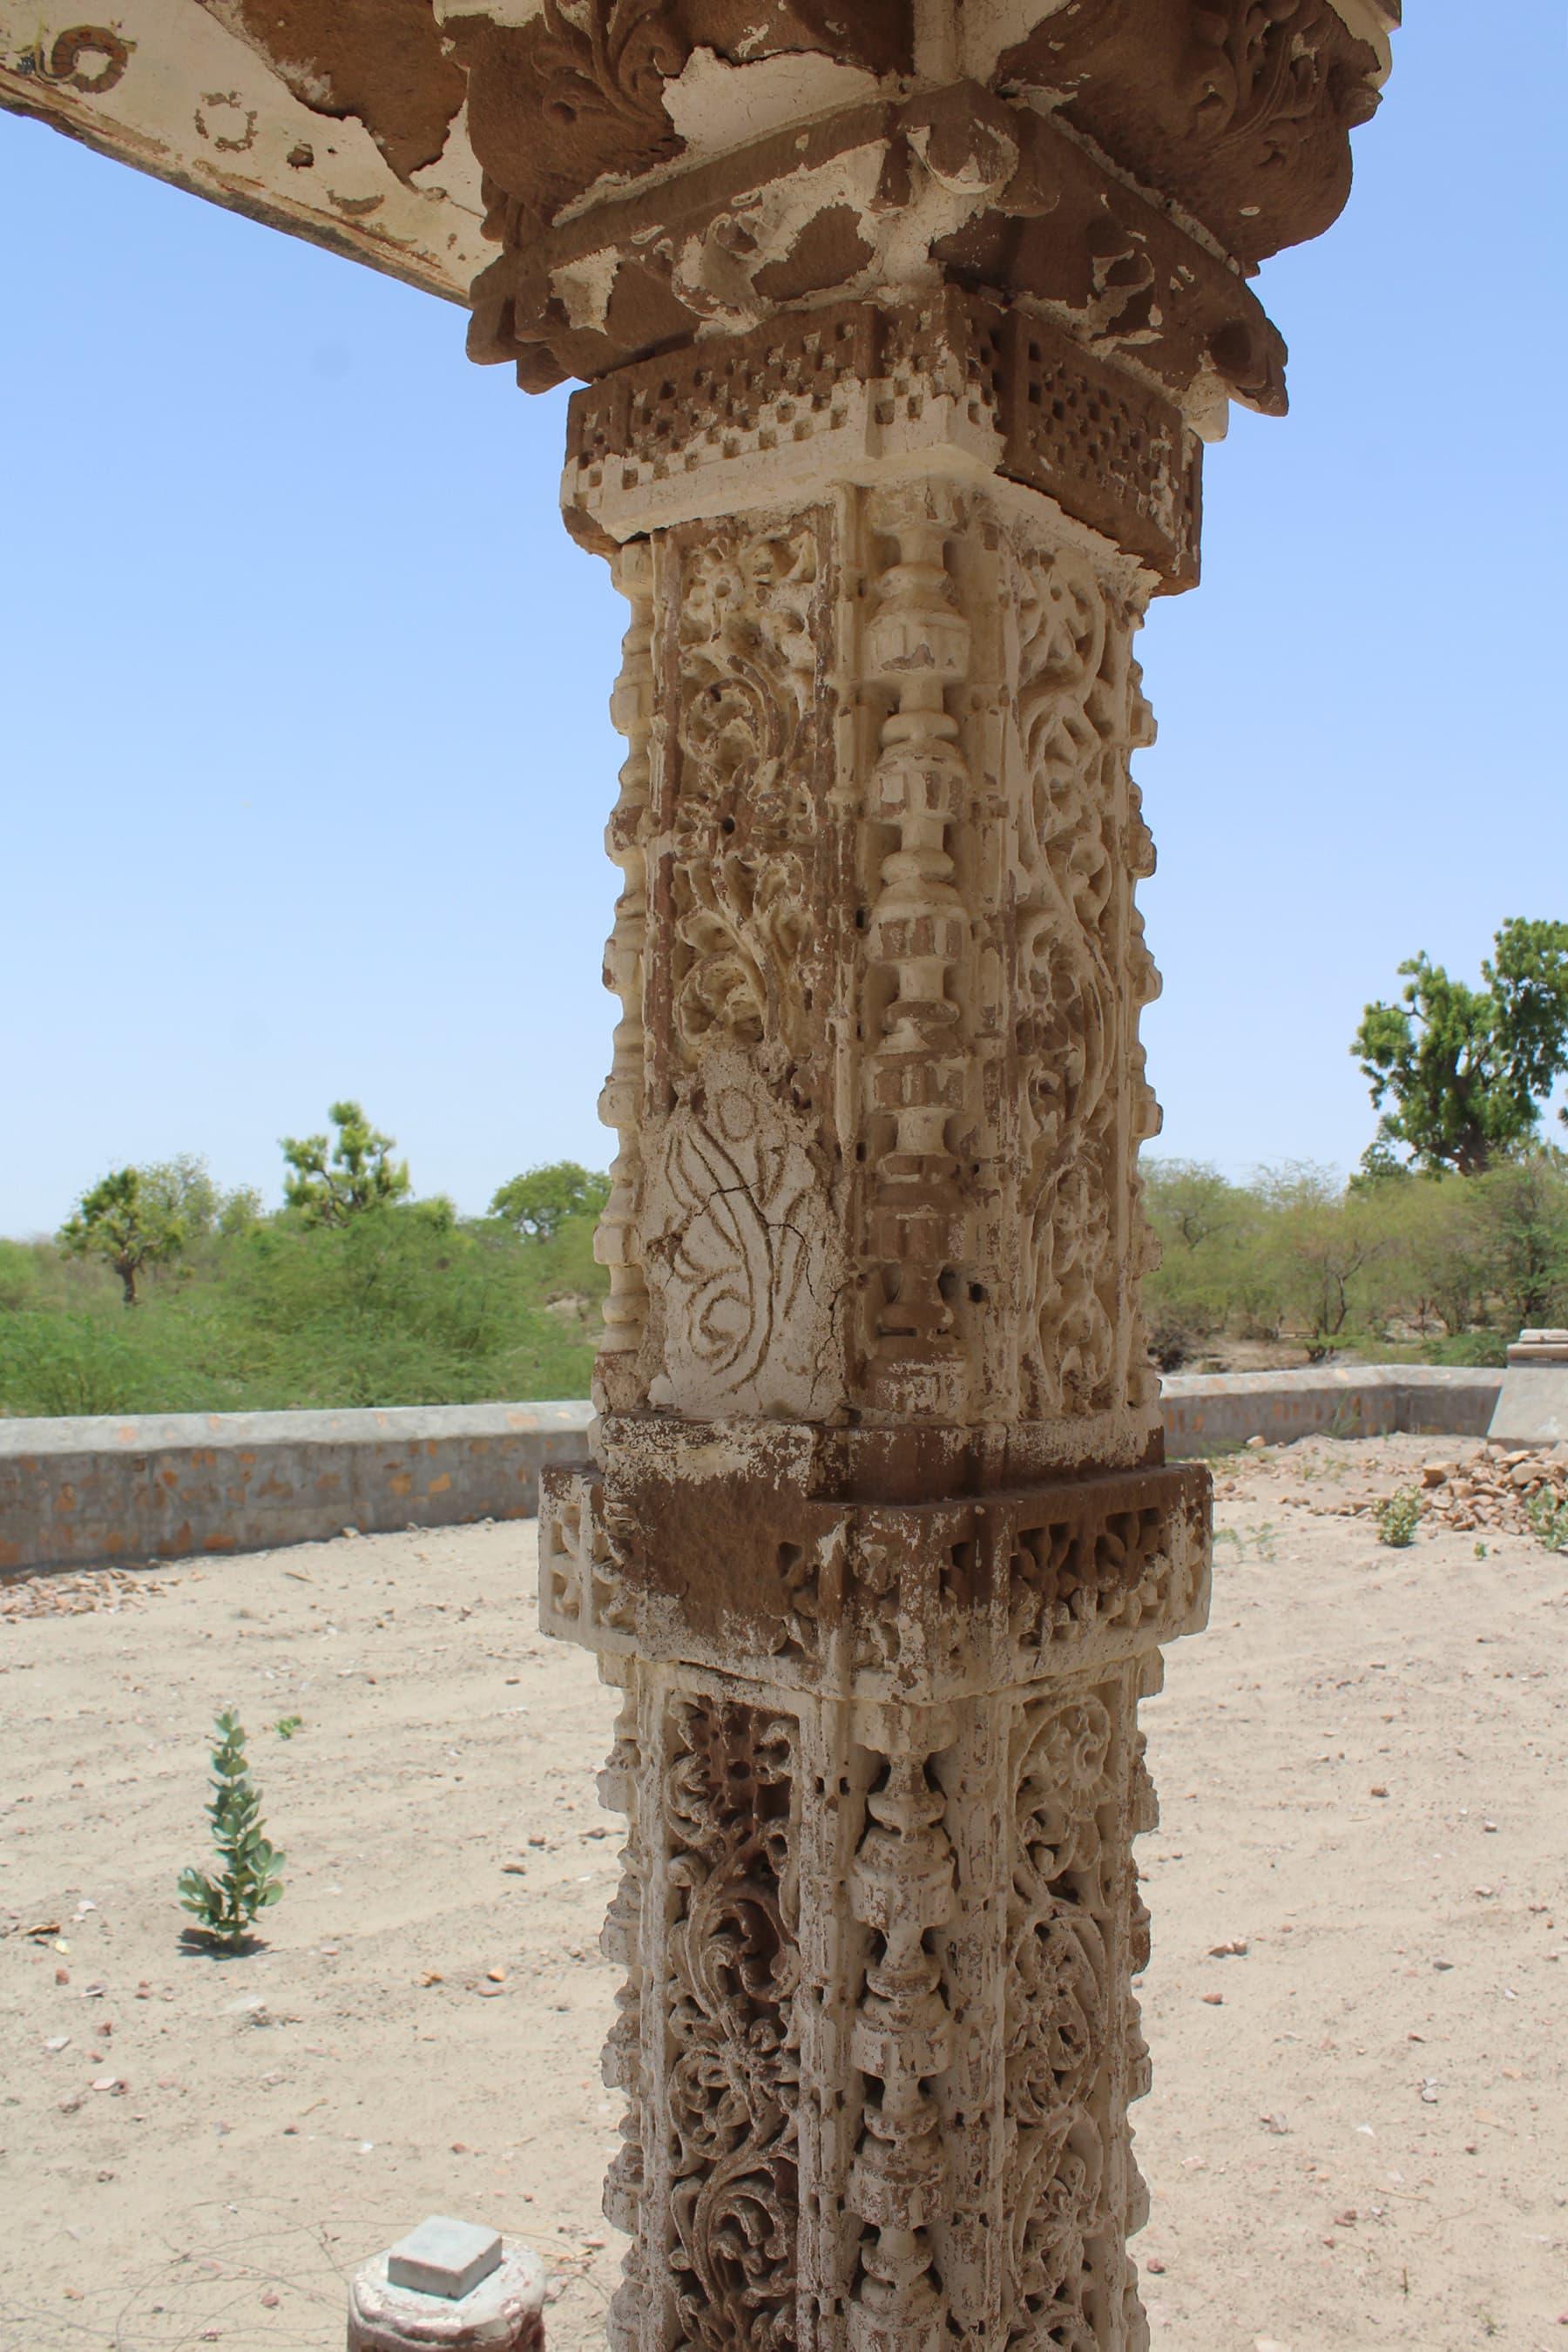 ویرا واہ مندر کا ایک ستون—تصویر اختر حفیظ